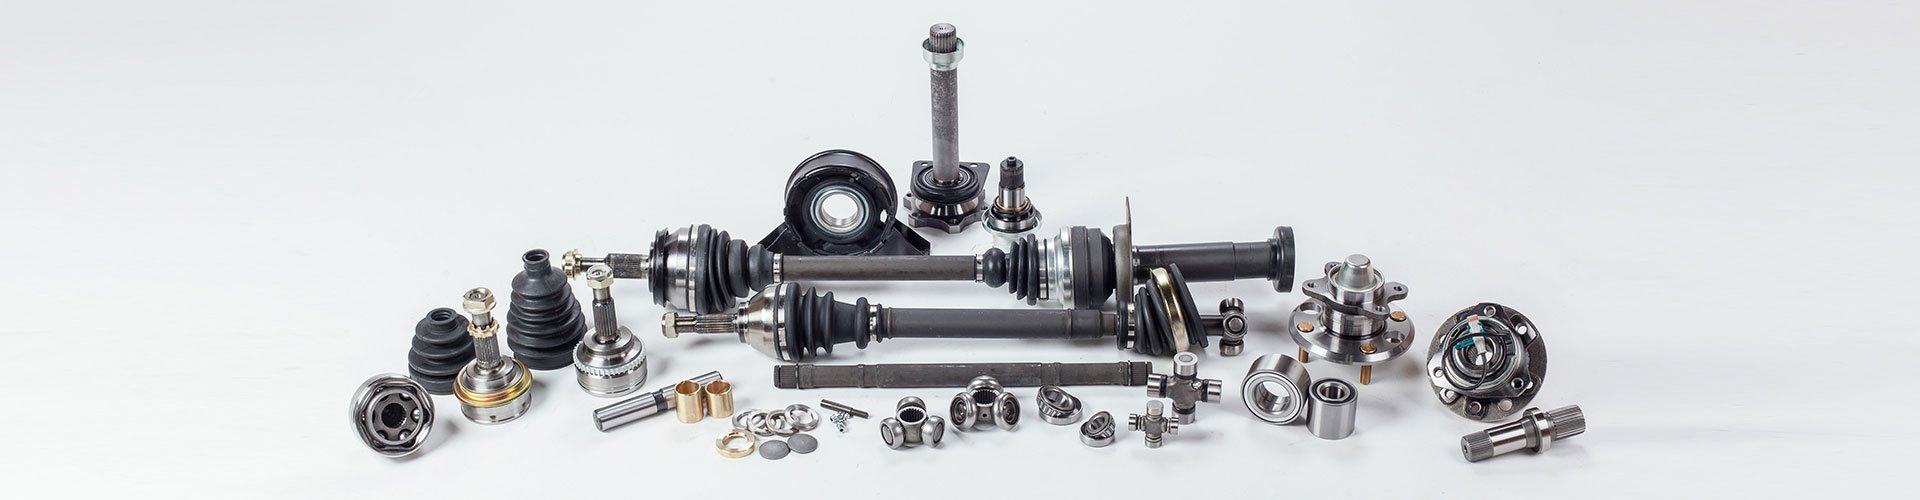 Auto parts 94